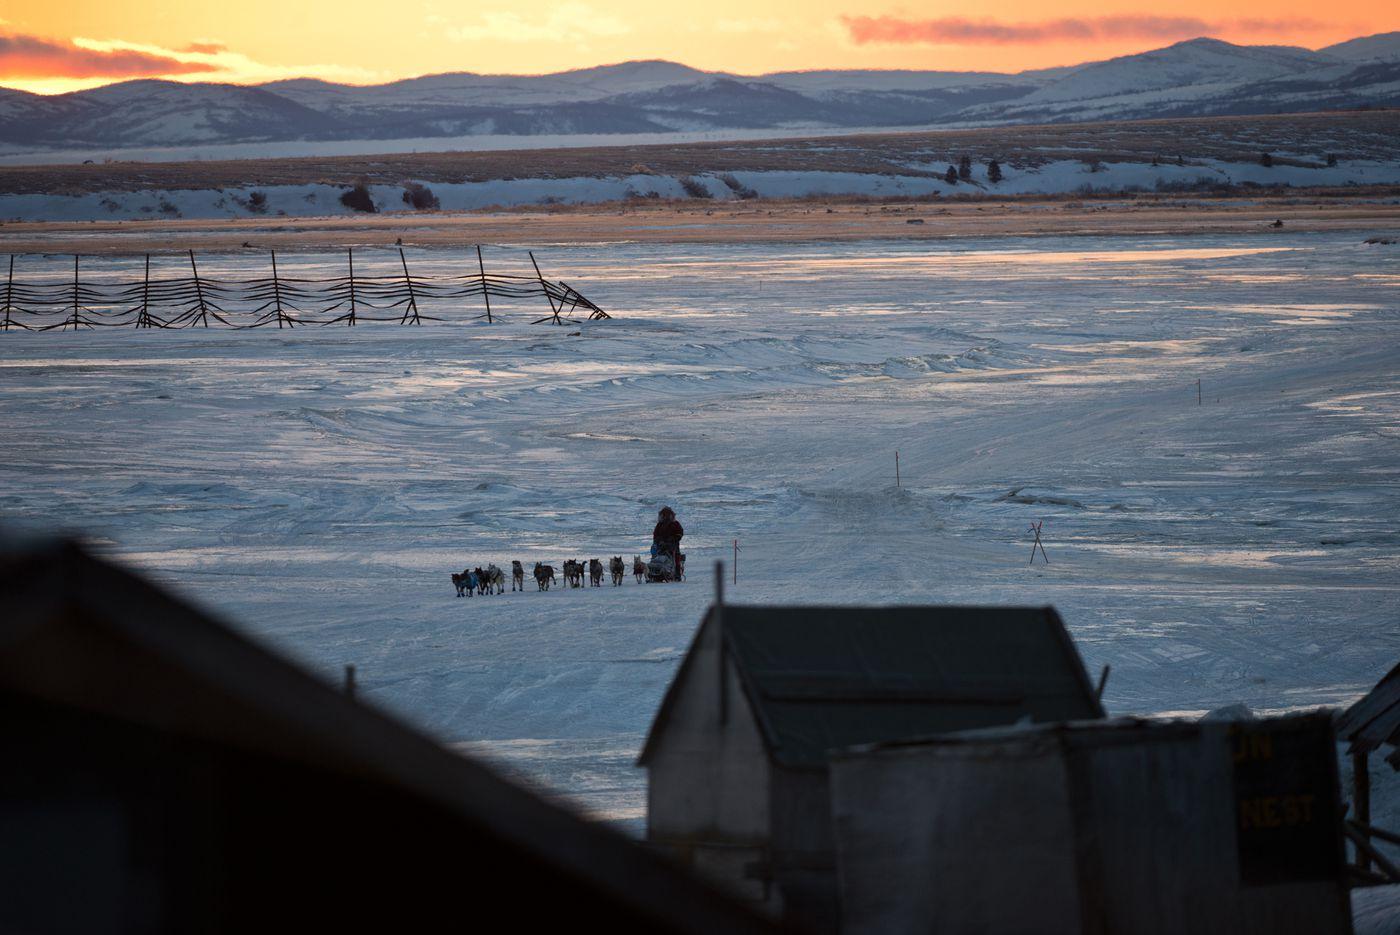 Iditarod musher Noah Burmeister arrives in Unalakleet at sunrise on Sunday, March 13, 2016.